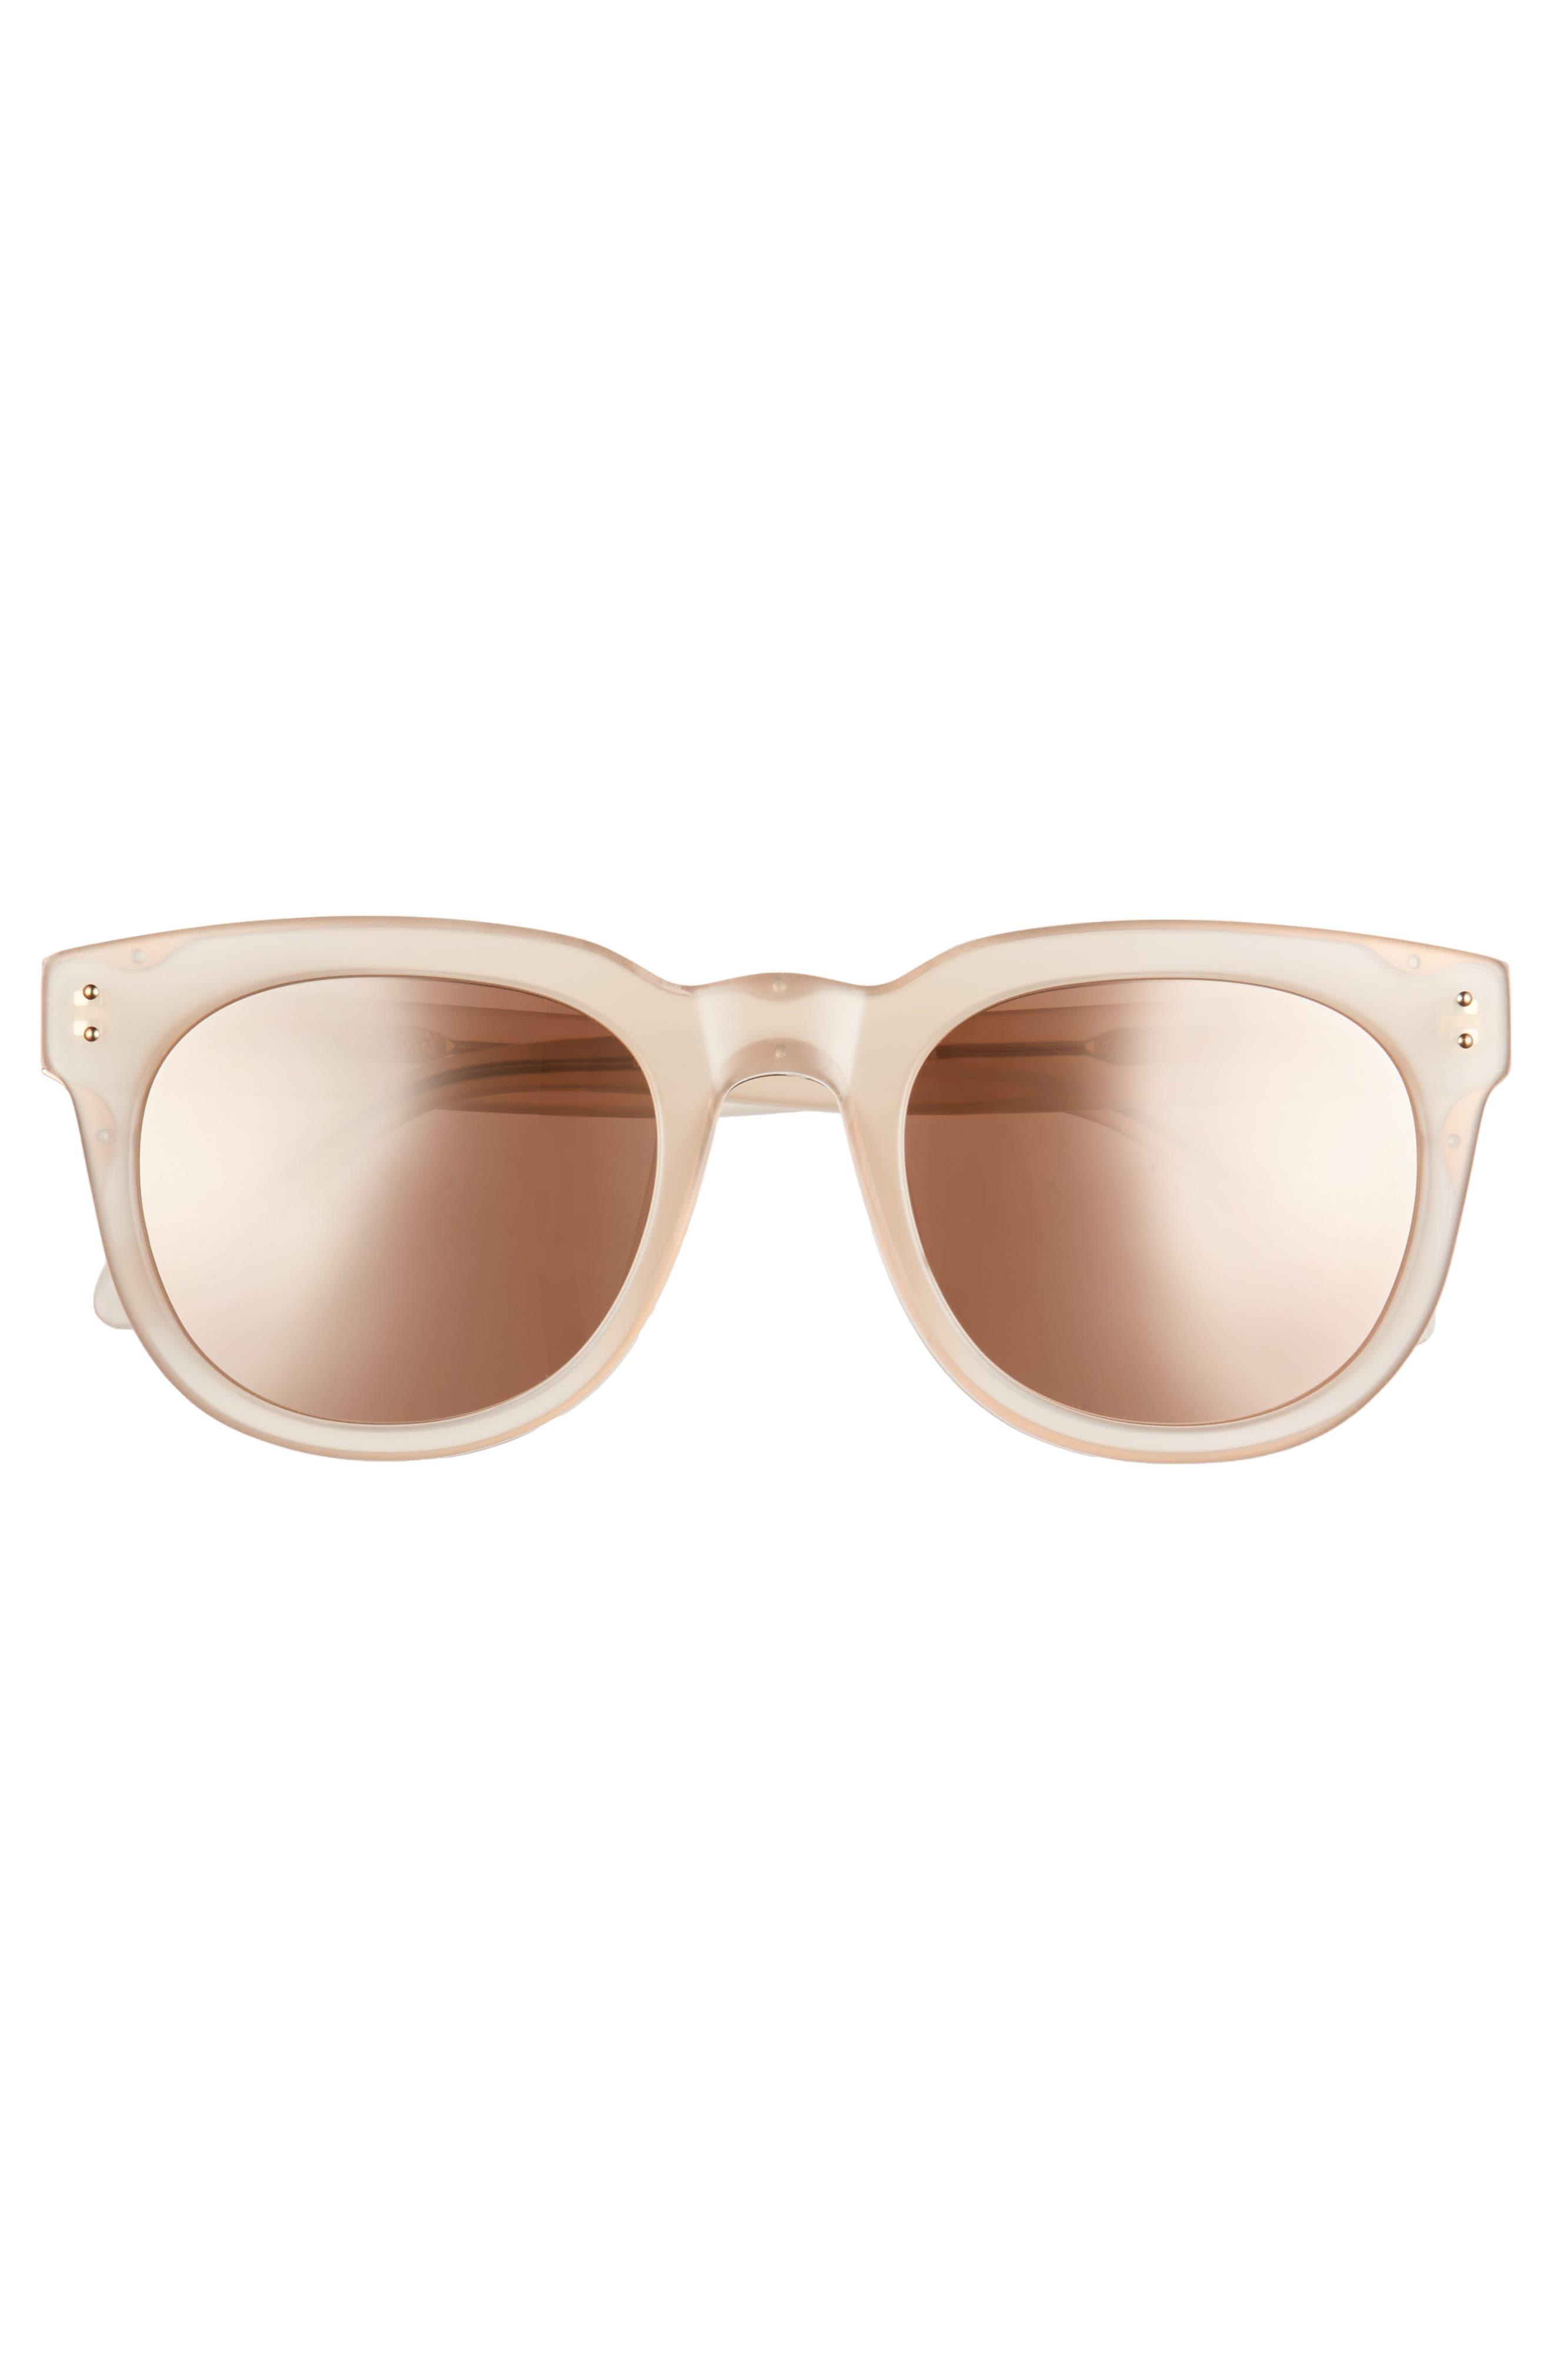 50mm D-Frame Mirrored Sunglasses,                             Alternate thumbnail 3, color,                             950